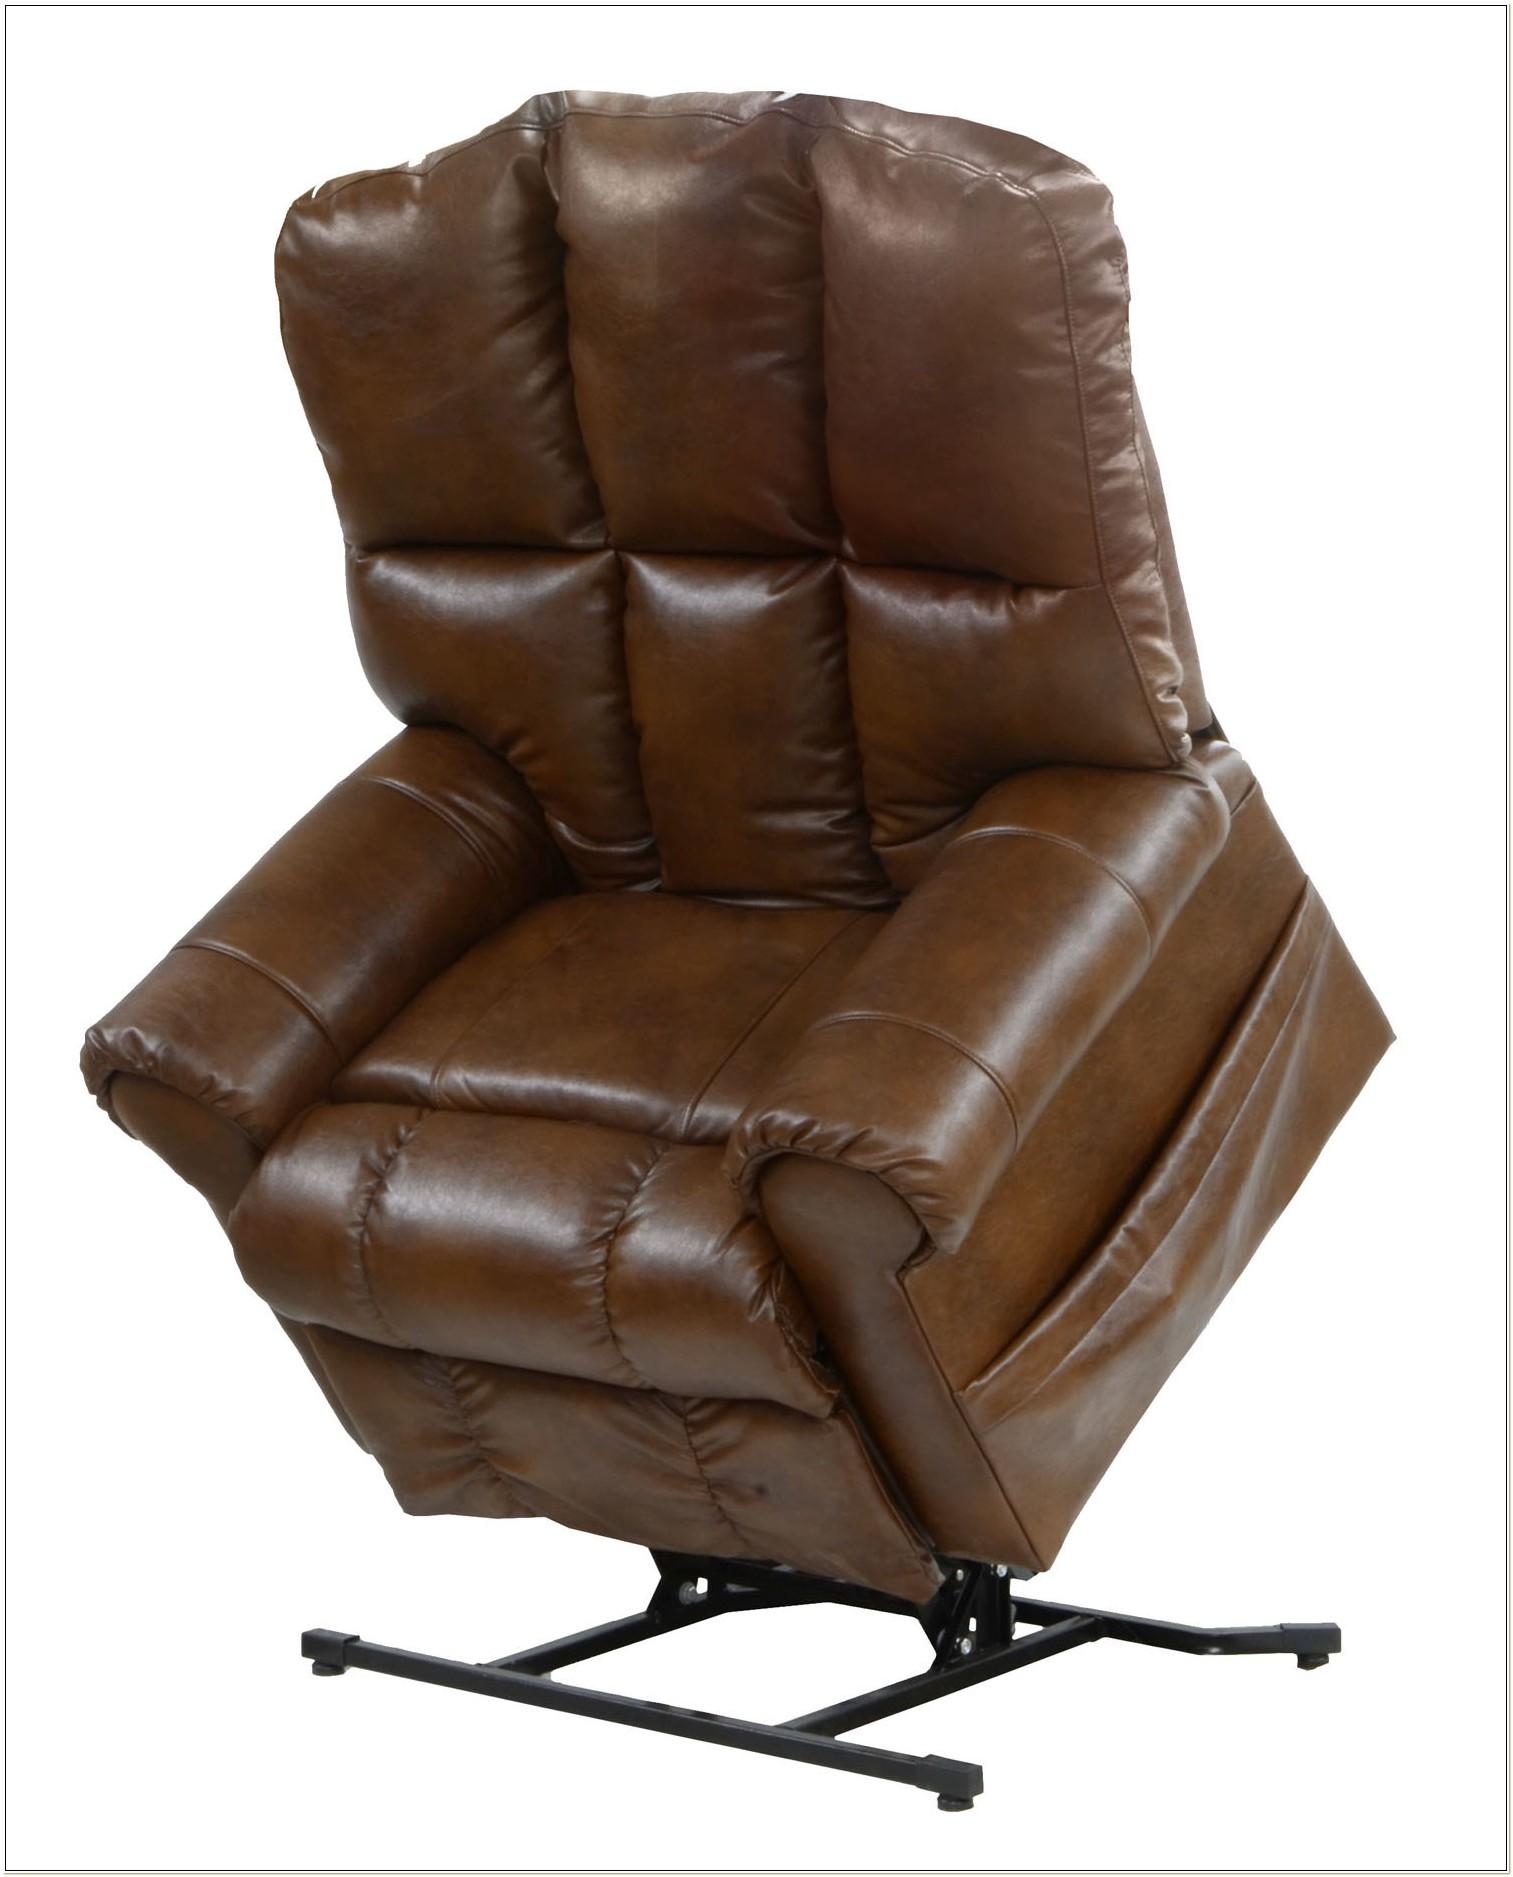 Heavy Duty Lift Chair Recliner